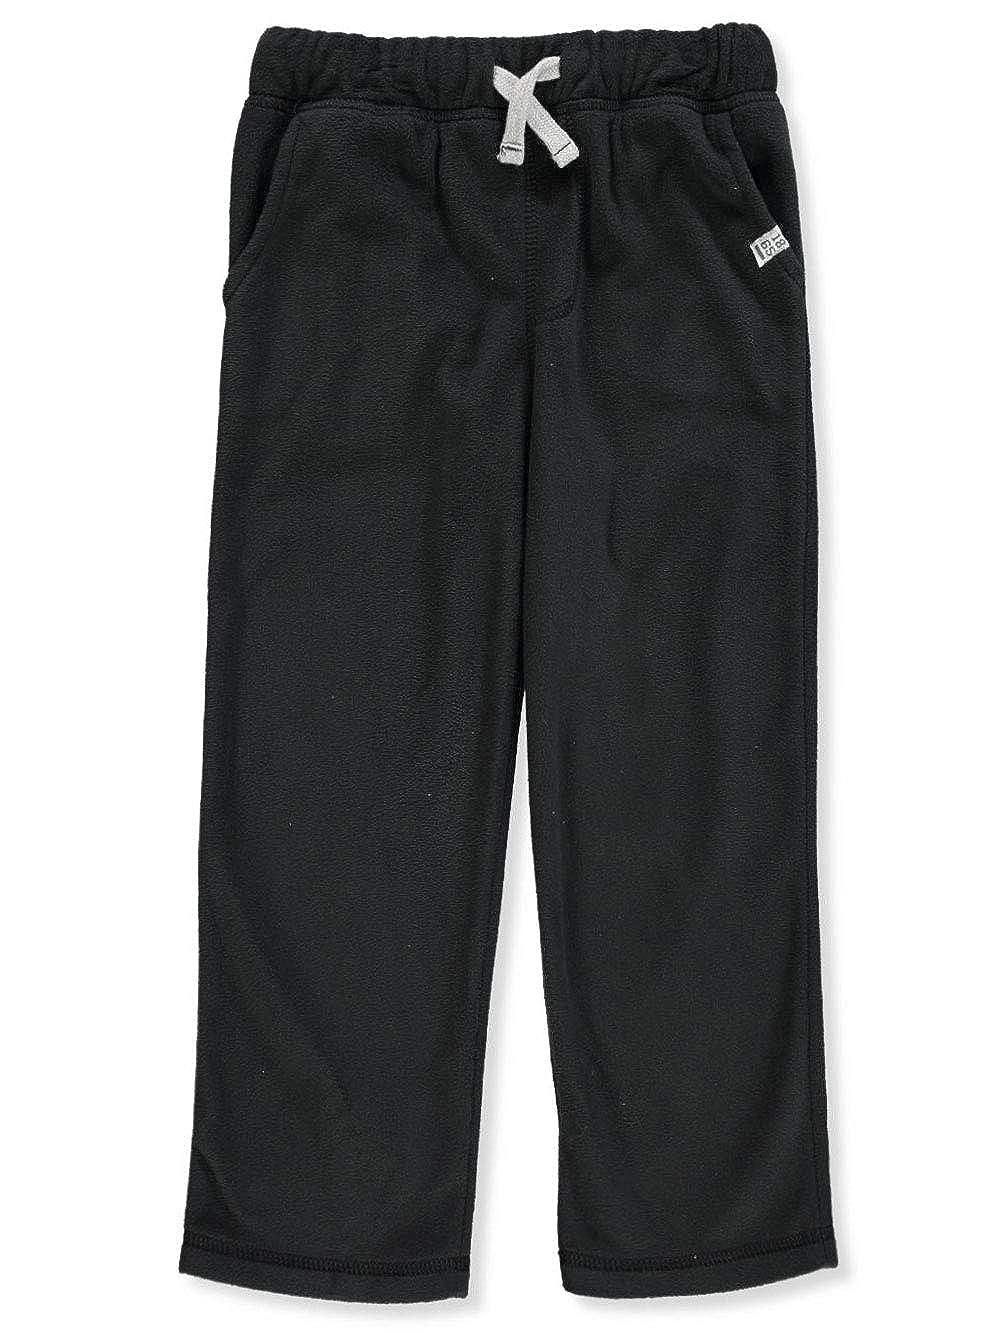 Carter's Boys' Fleece Pants Carter' s